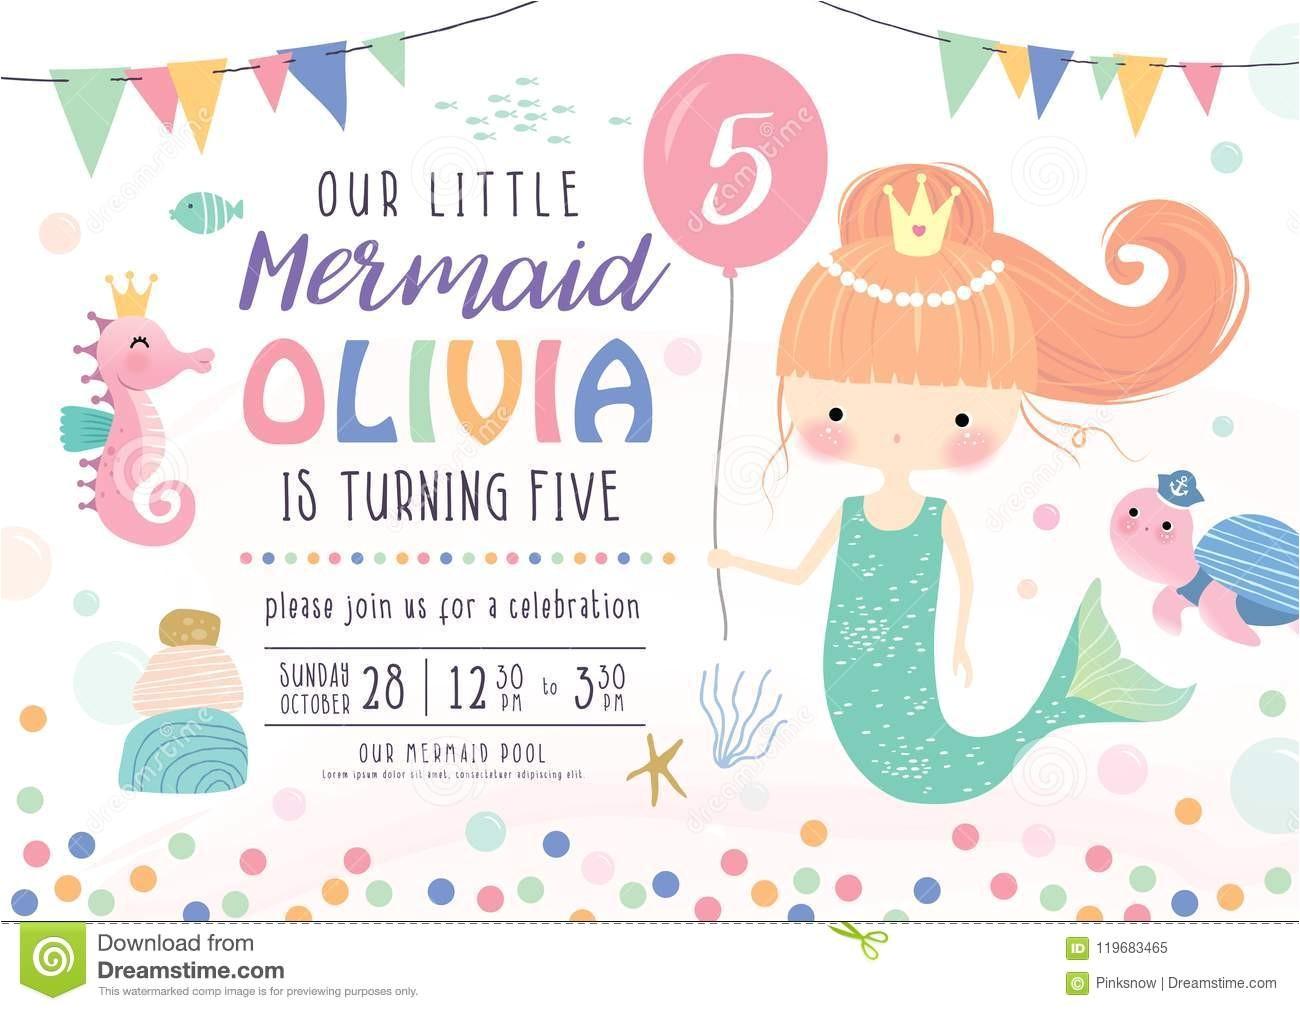 kids under sea birthday party invitation card cute little mermaid marine life kids birthday party invitation card image119683465